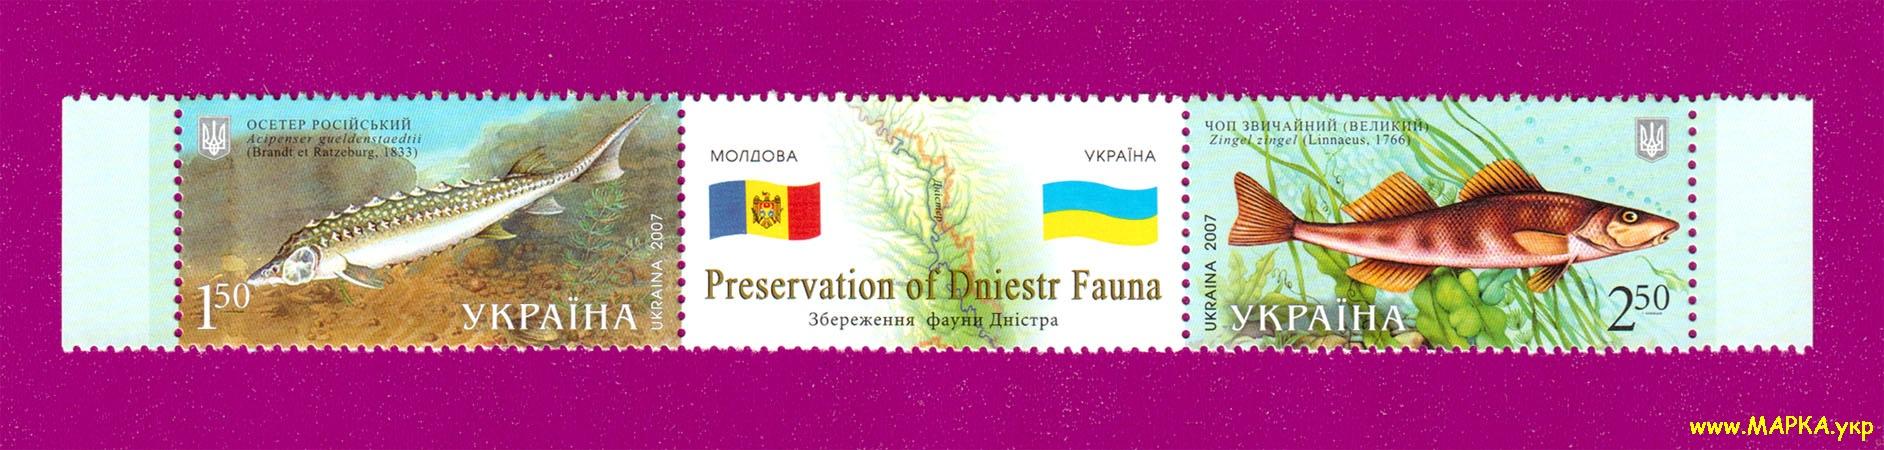 2007 сцепка Фауна Украина-Молдавия рыбы Украина